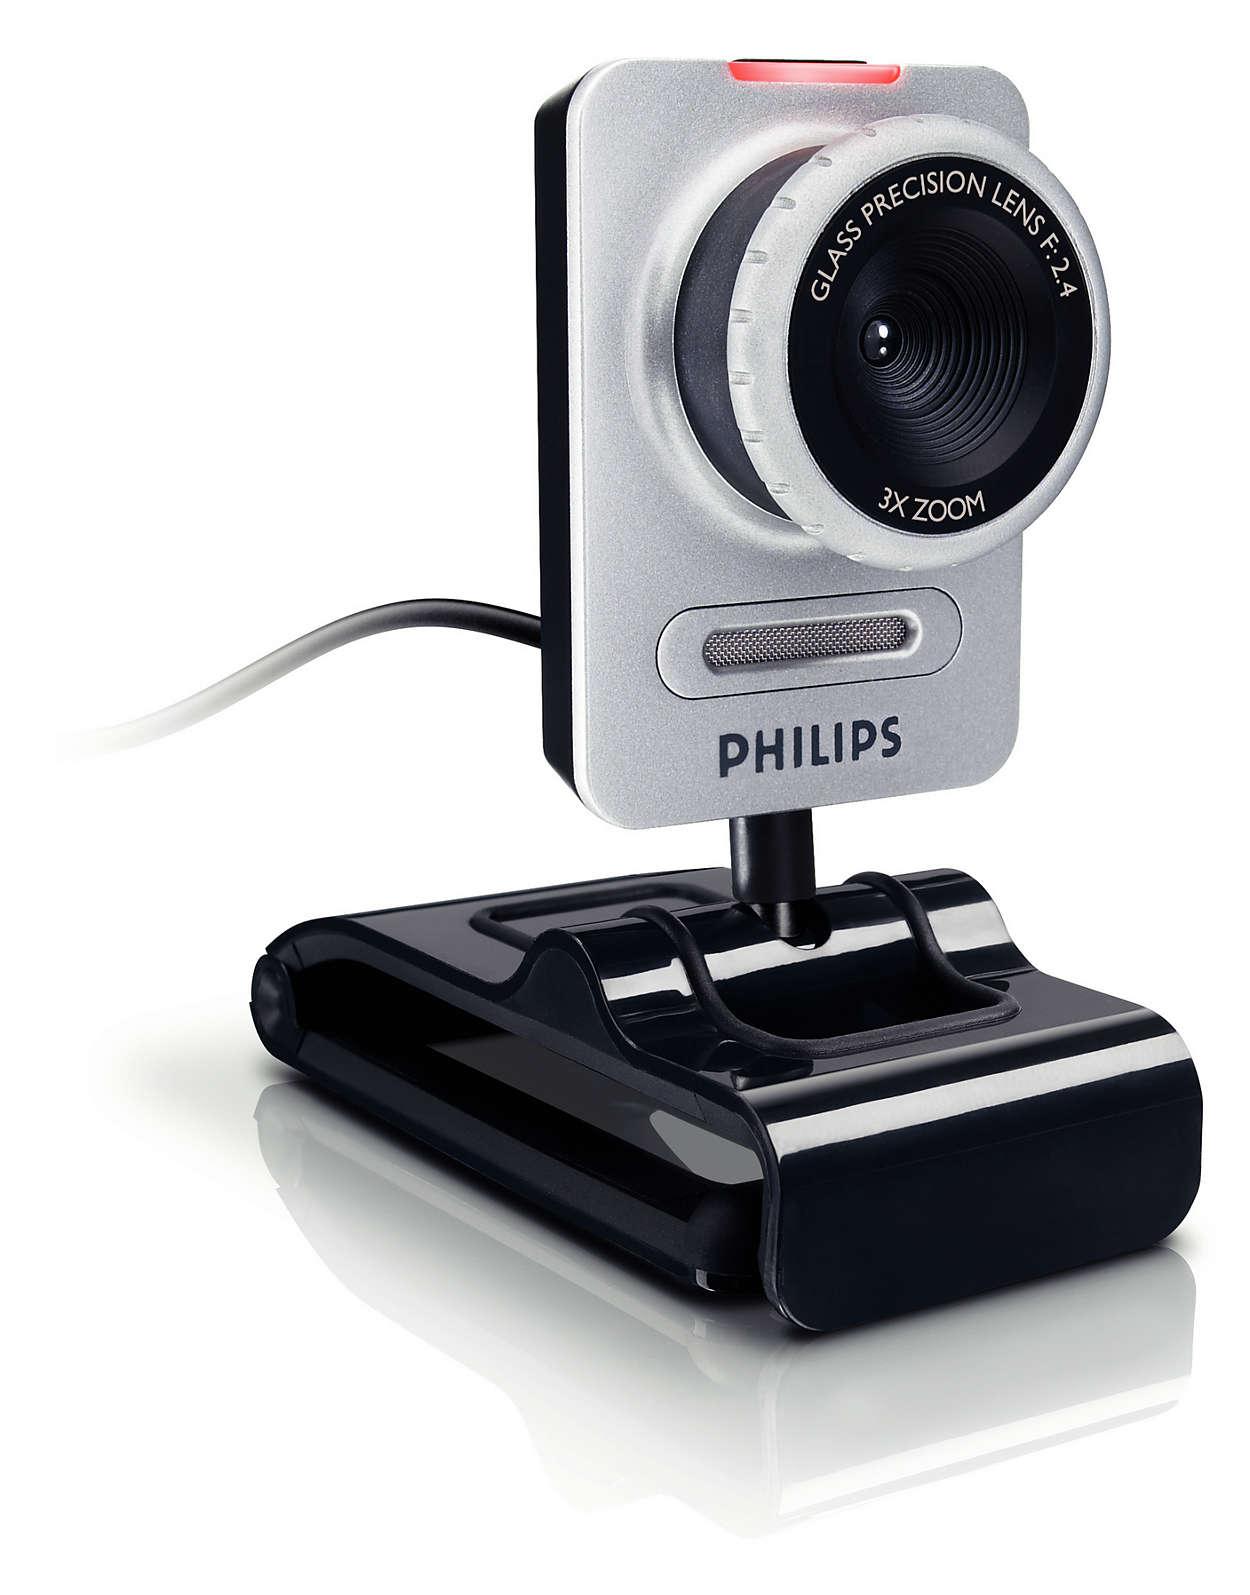 Morsomt web-kamera